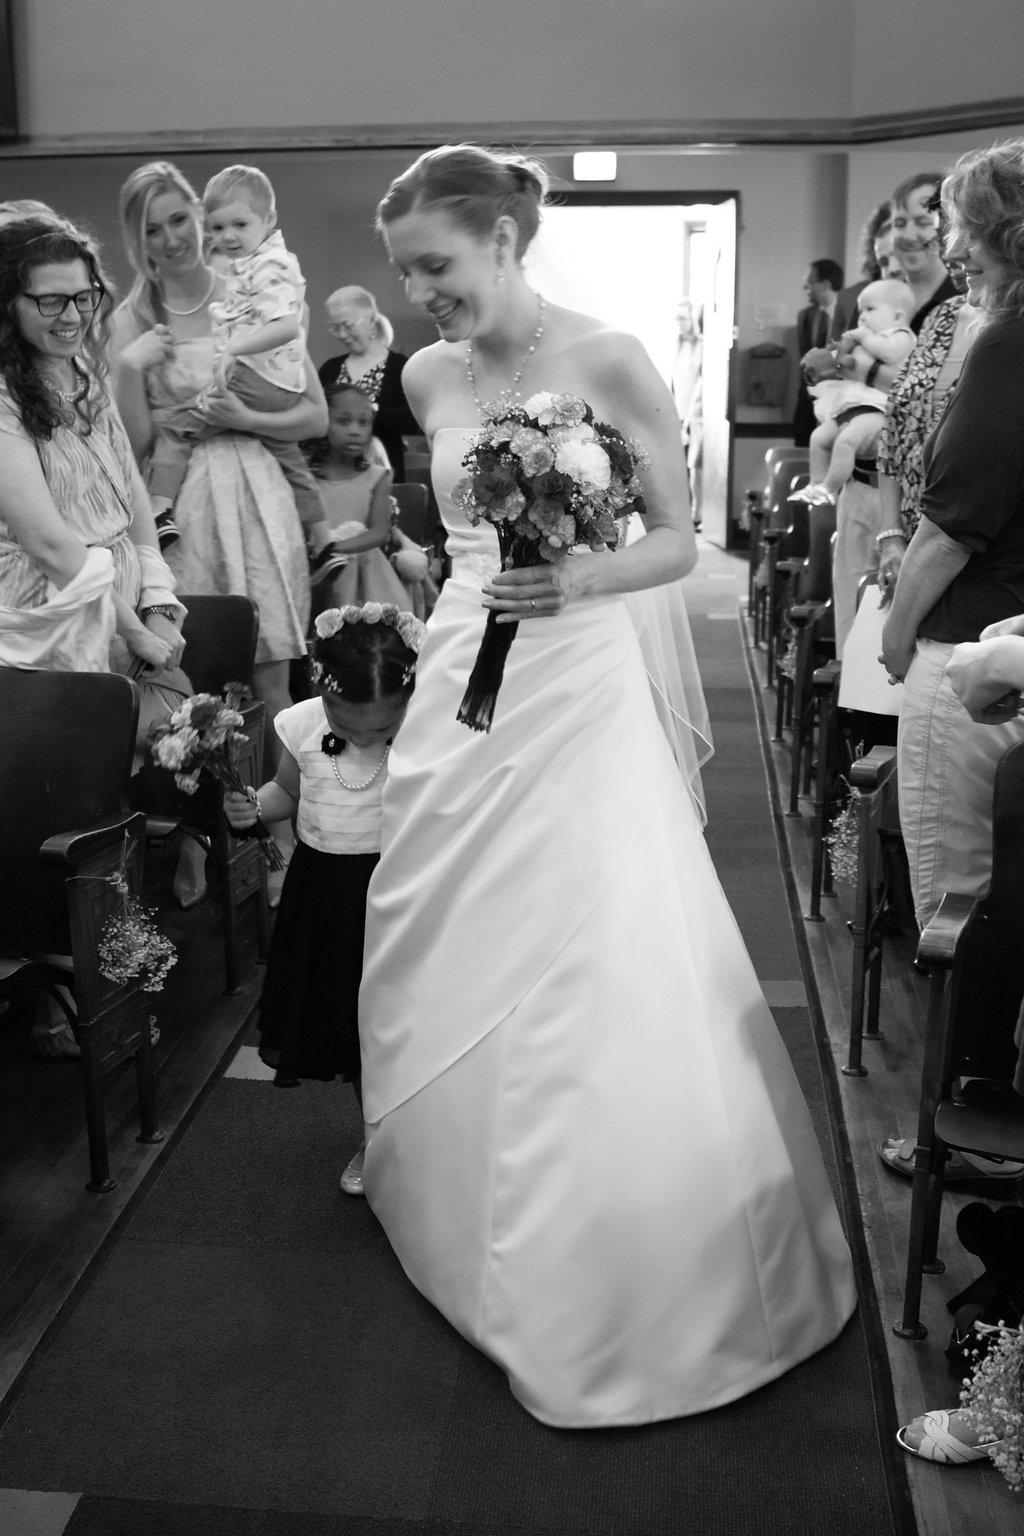 jakeandsuze_weddingselects-59.jpg